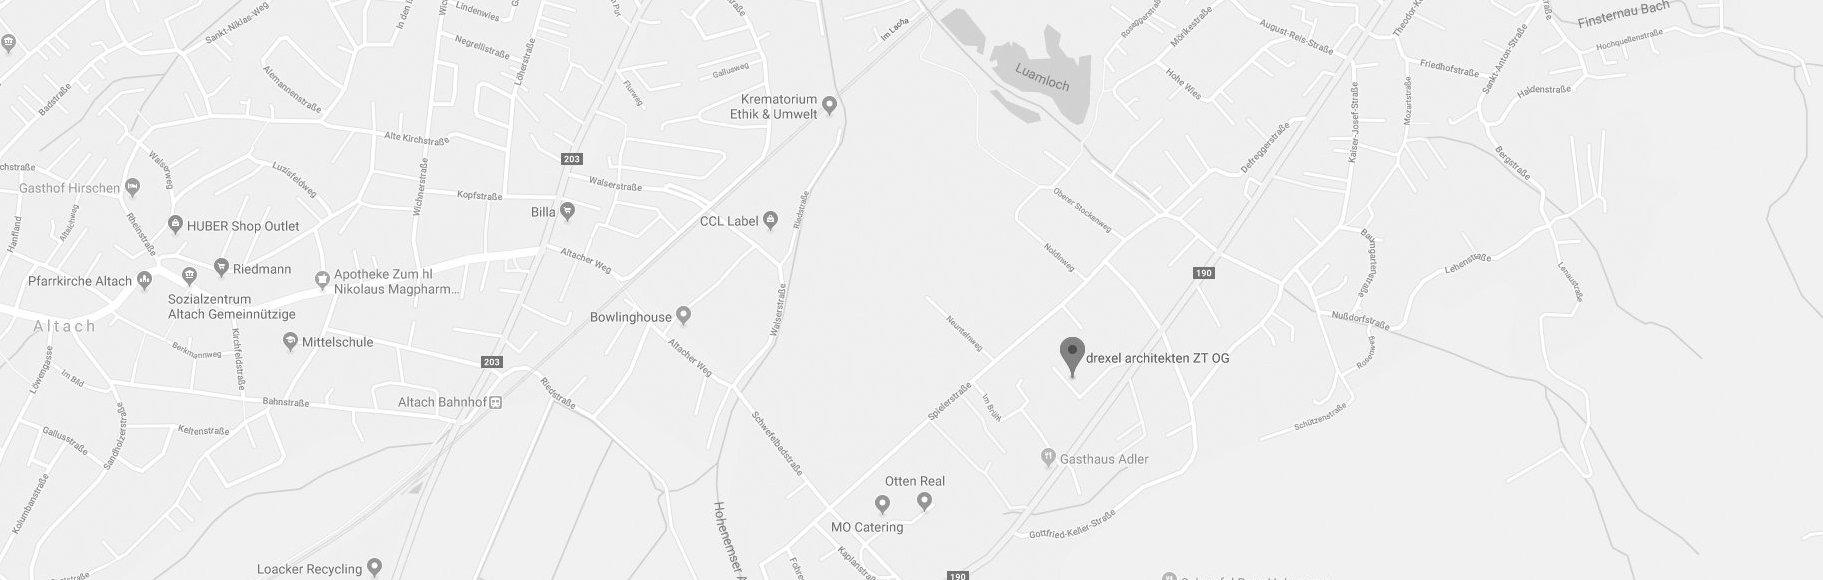 google map drexel architekten